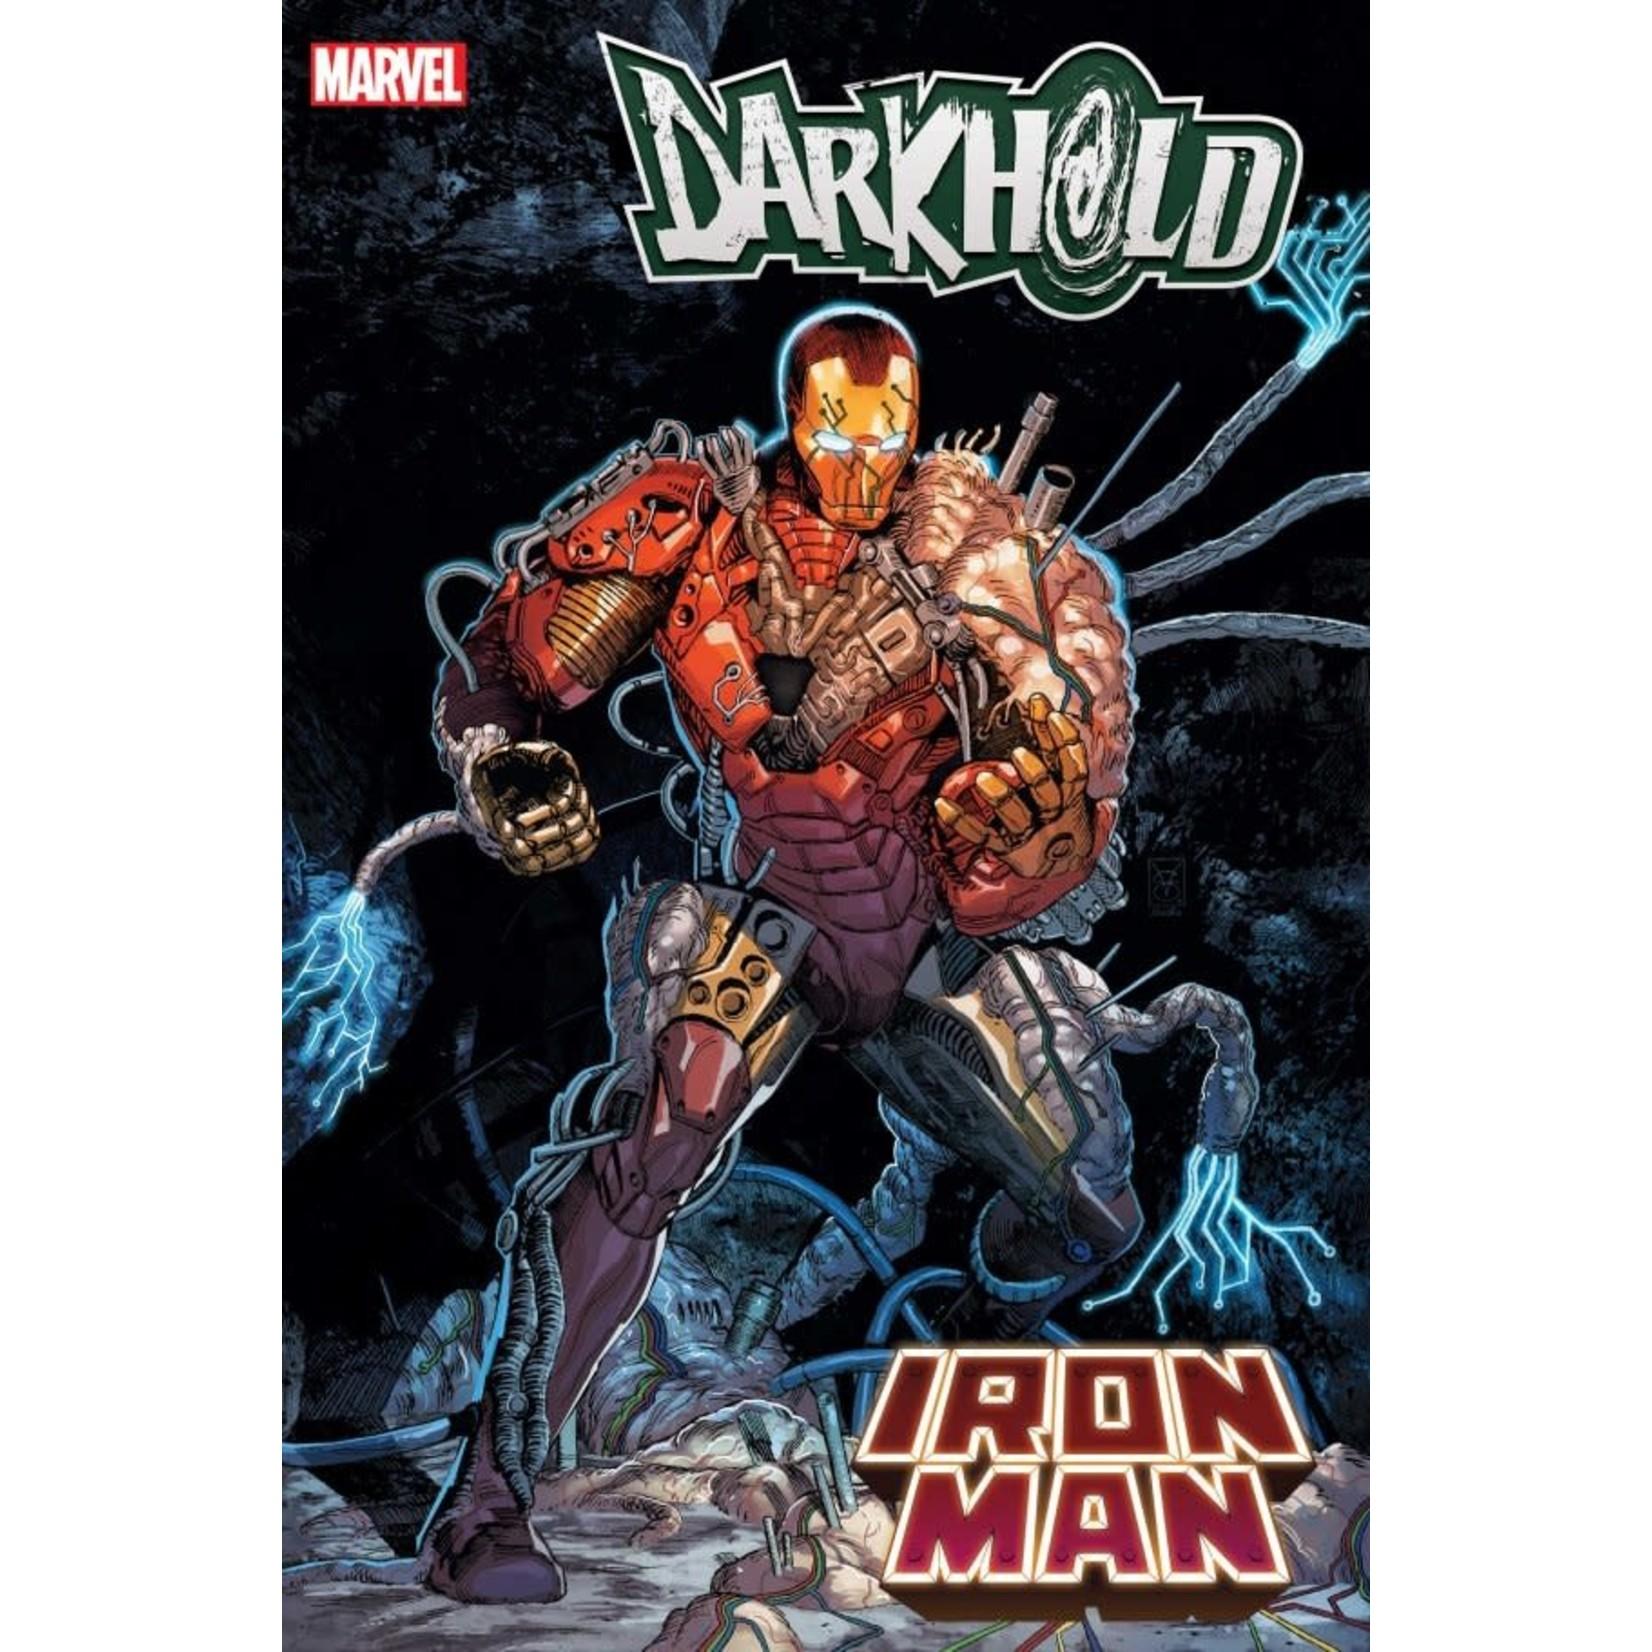 Darkhold: Iron Man #1